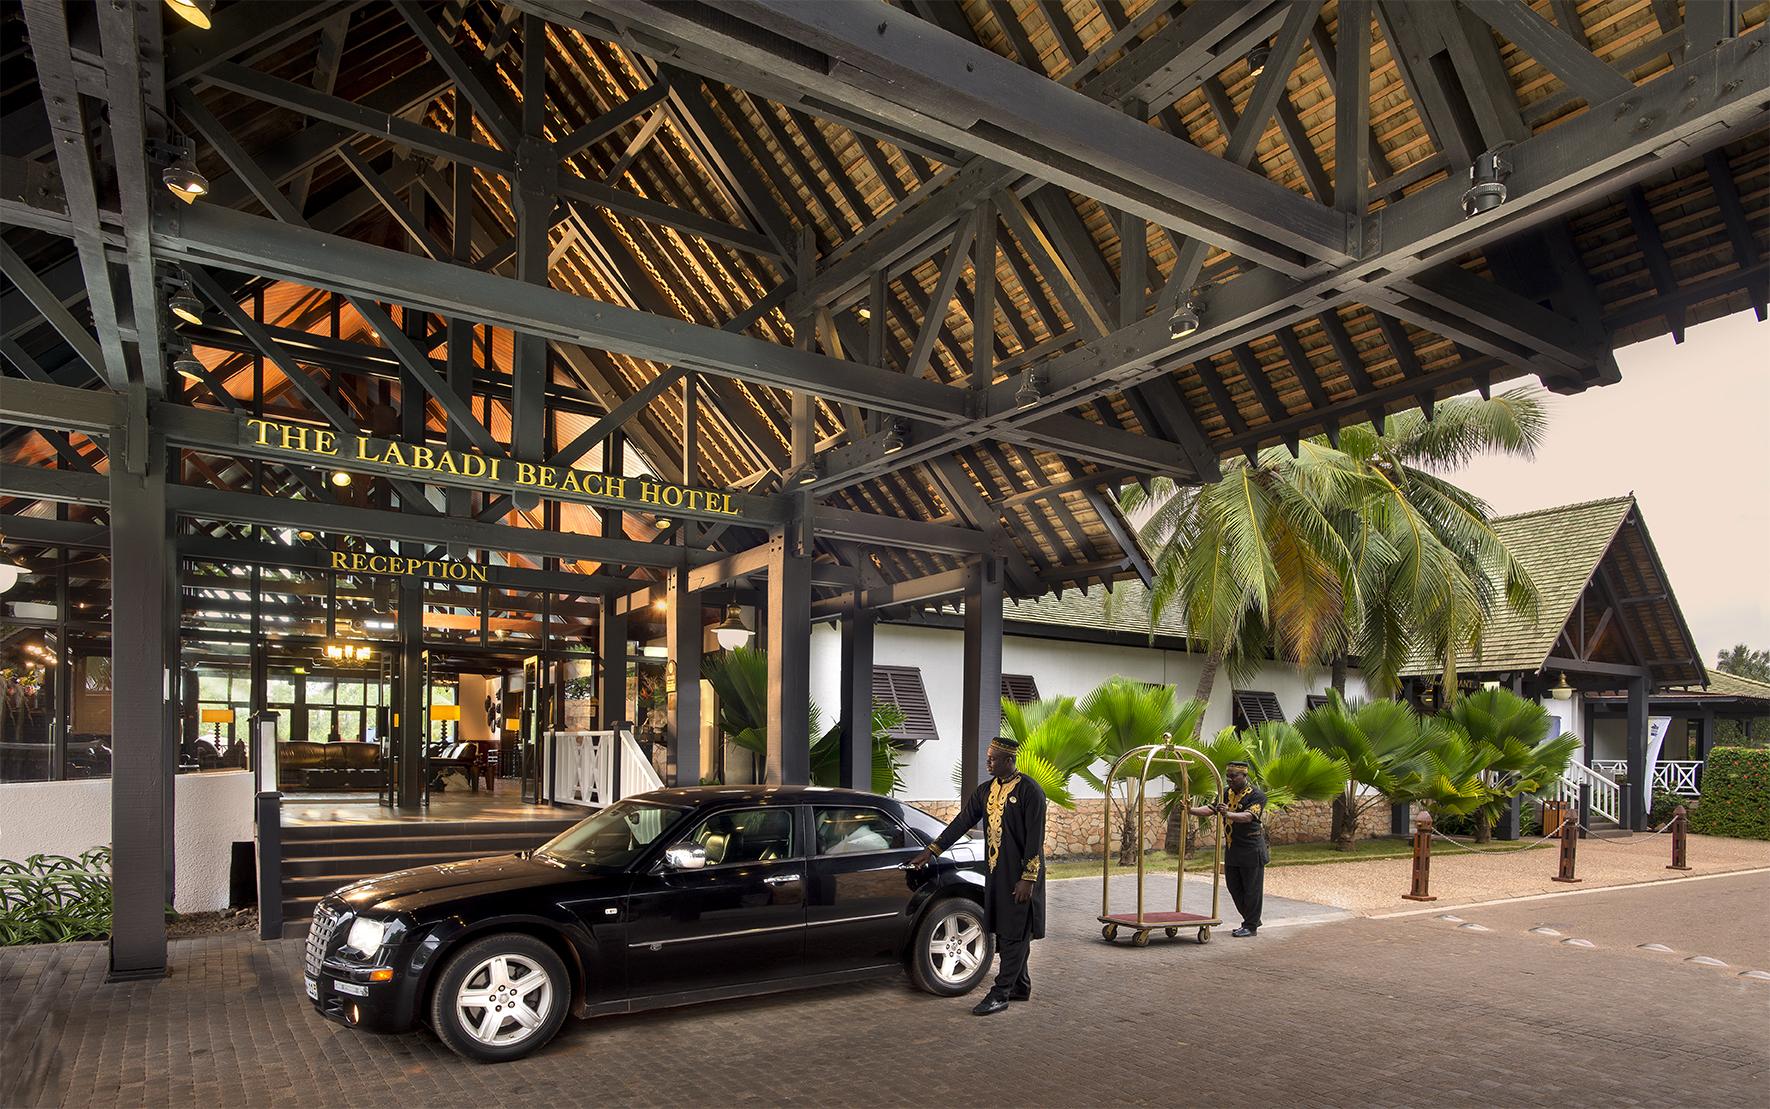 The Lababi Beach Hotel entrance